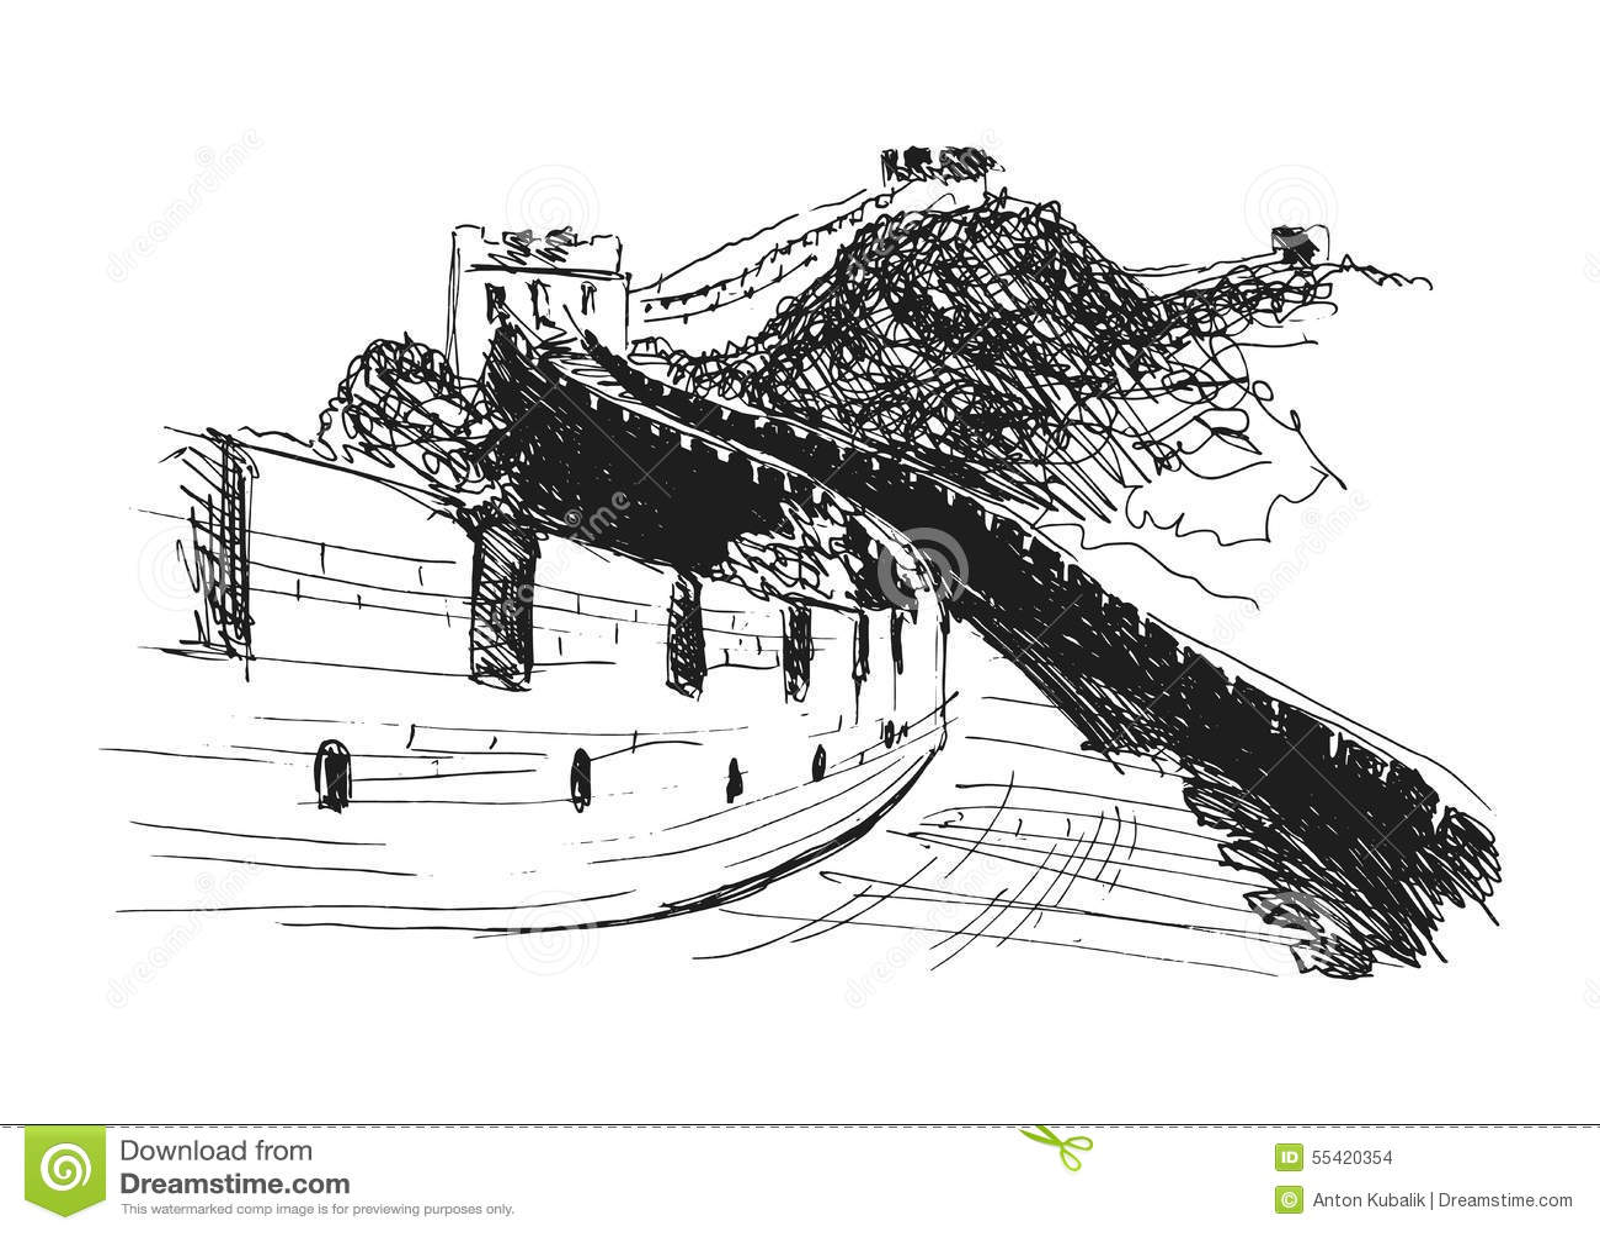 Jinshanling Cartoons Illustrations Amp Vector Stock Images